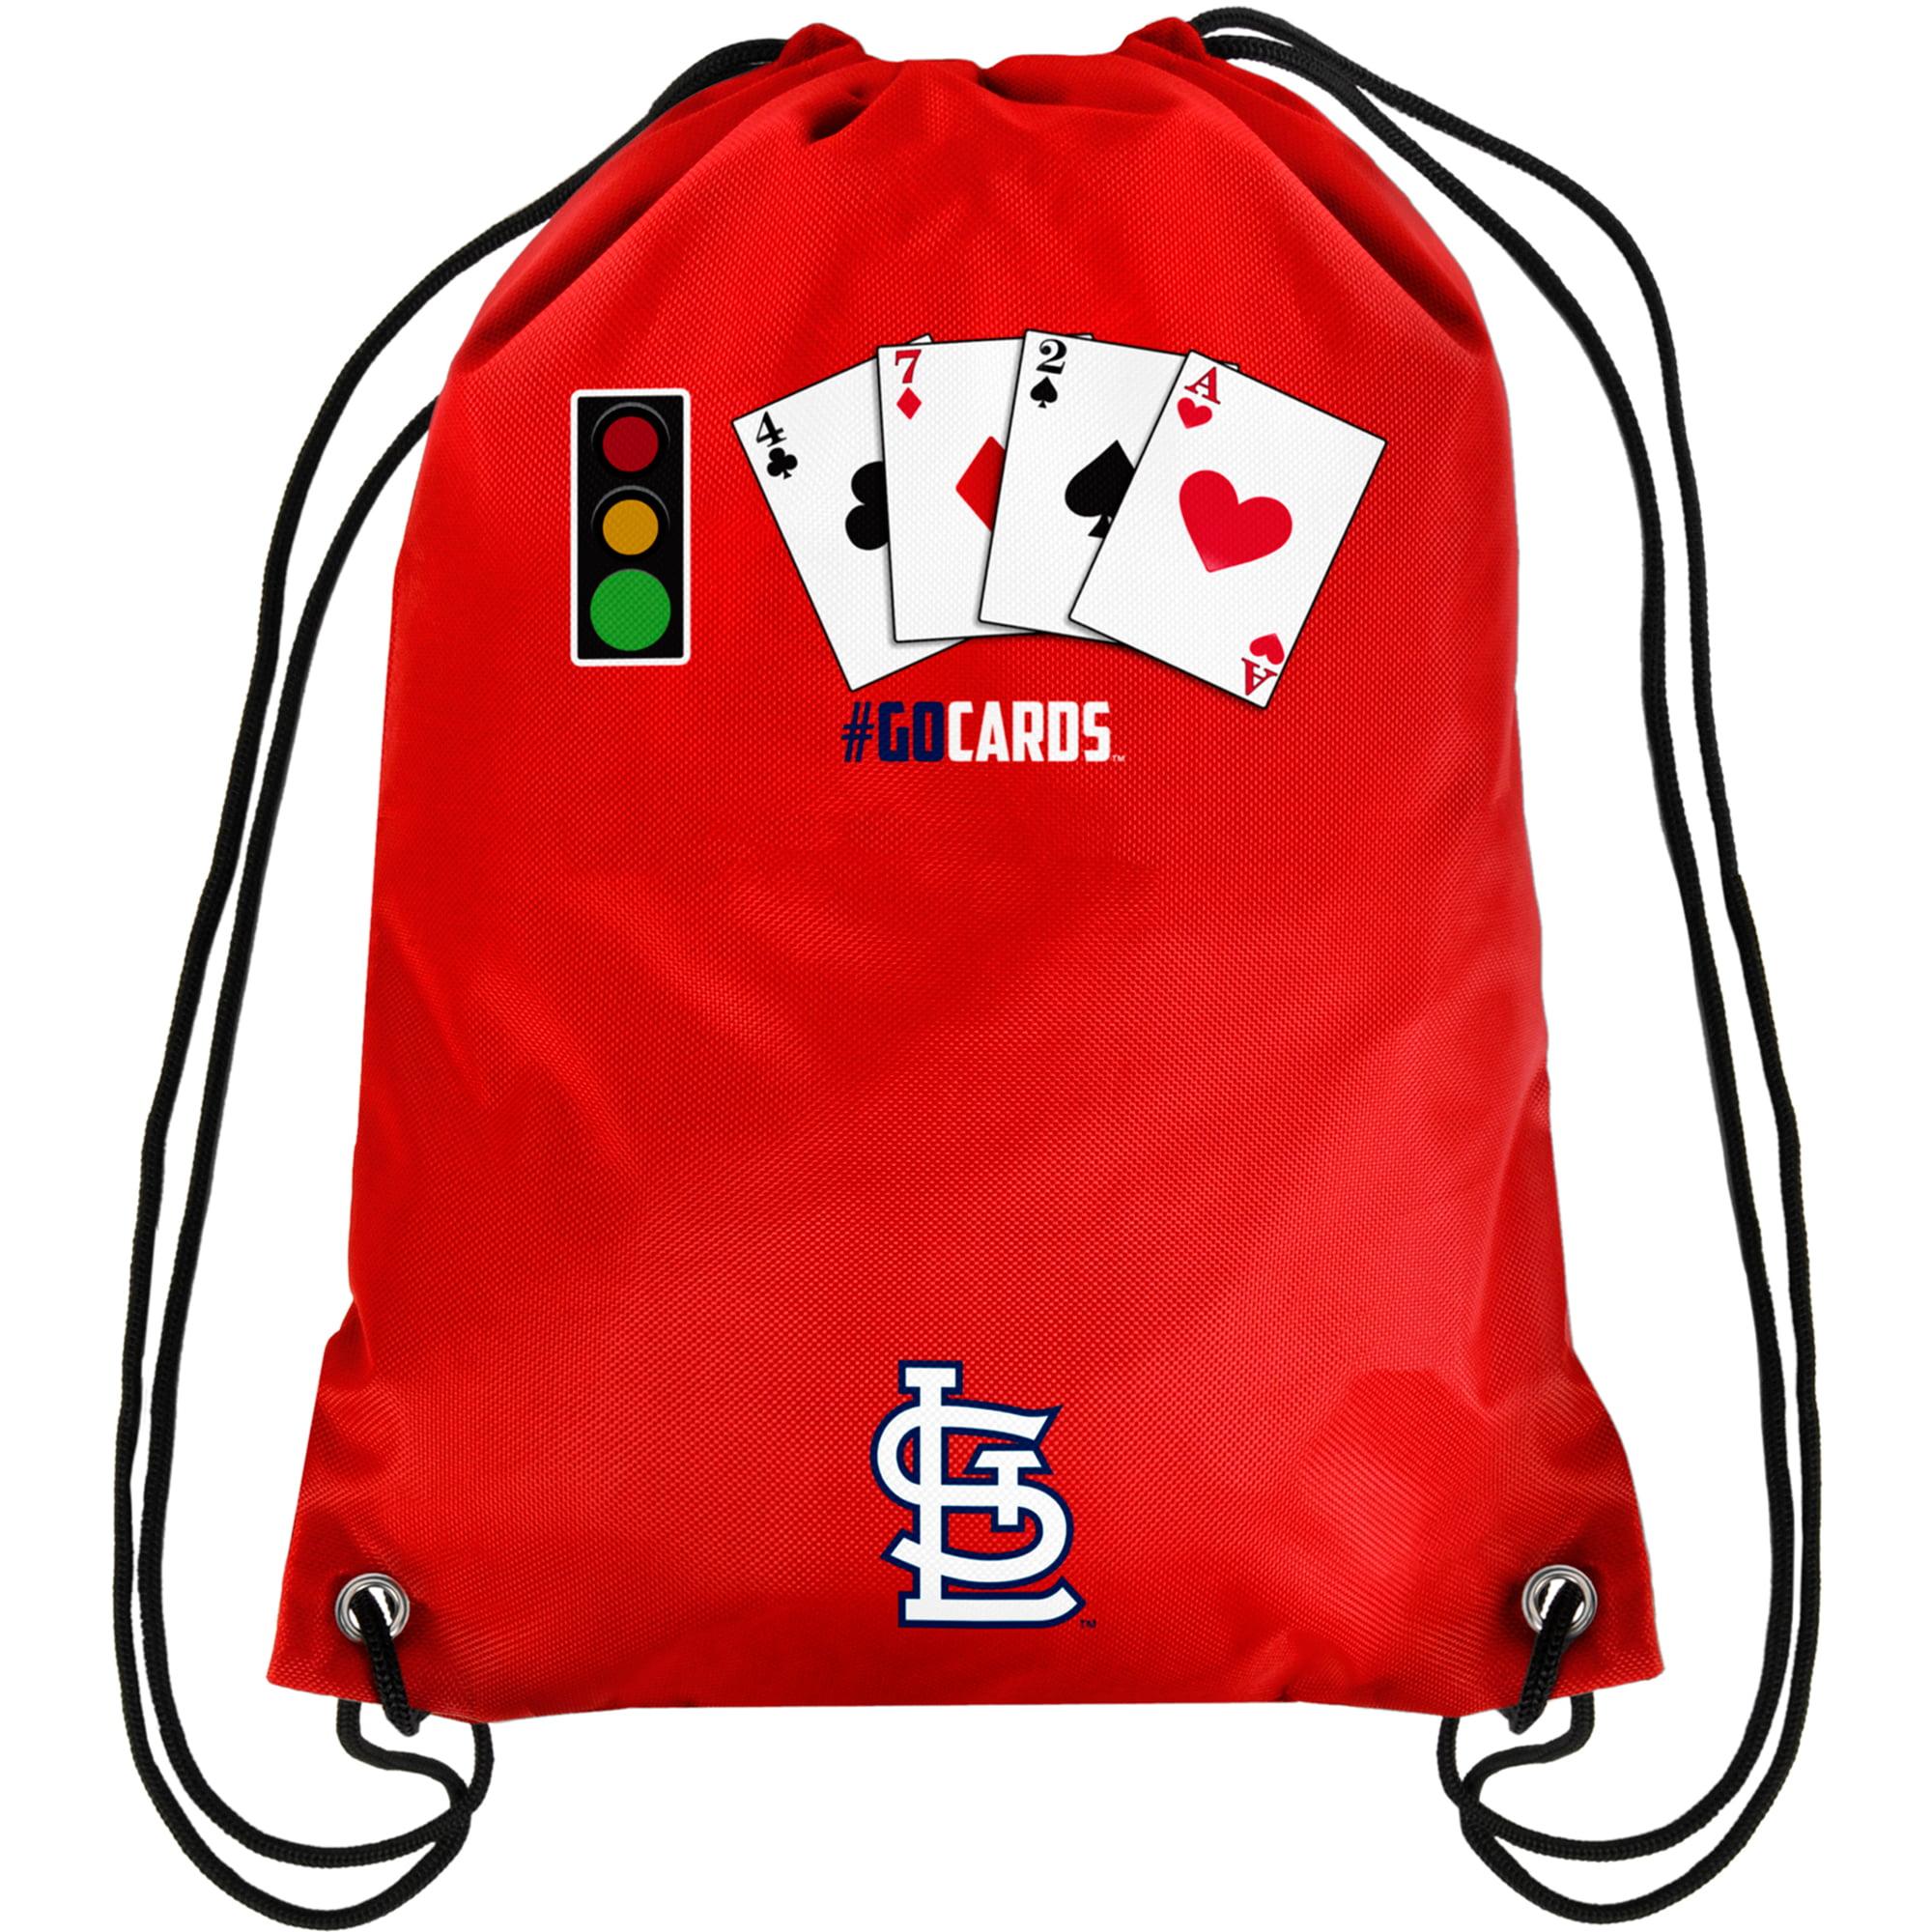 St. Louis Cardinals Teamoji Drawstring Backpack - No Size